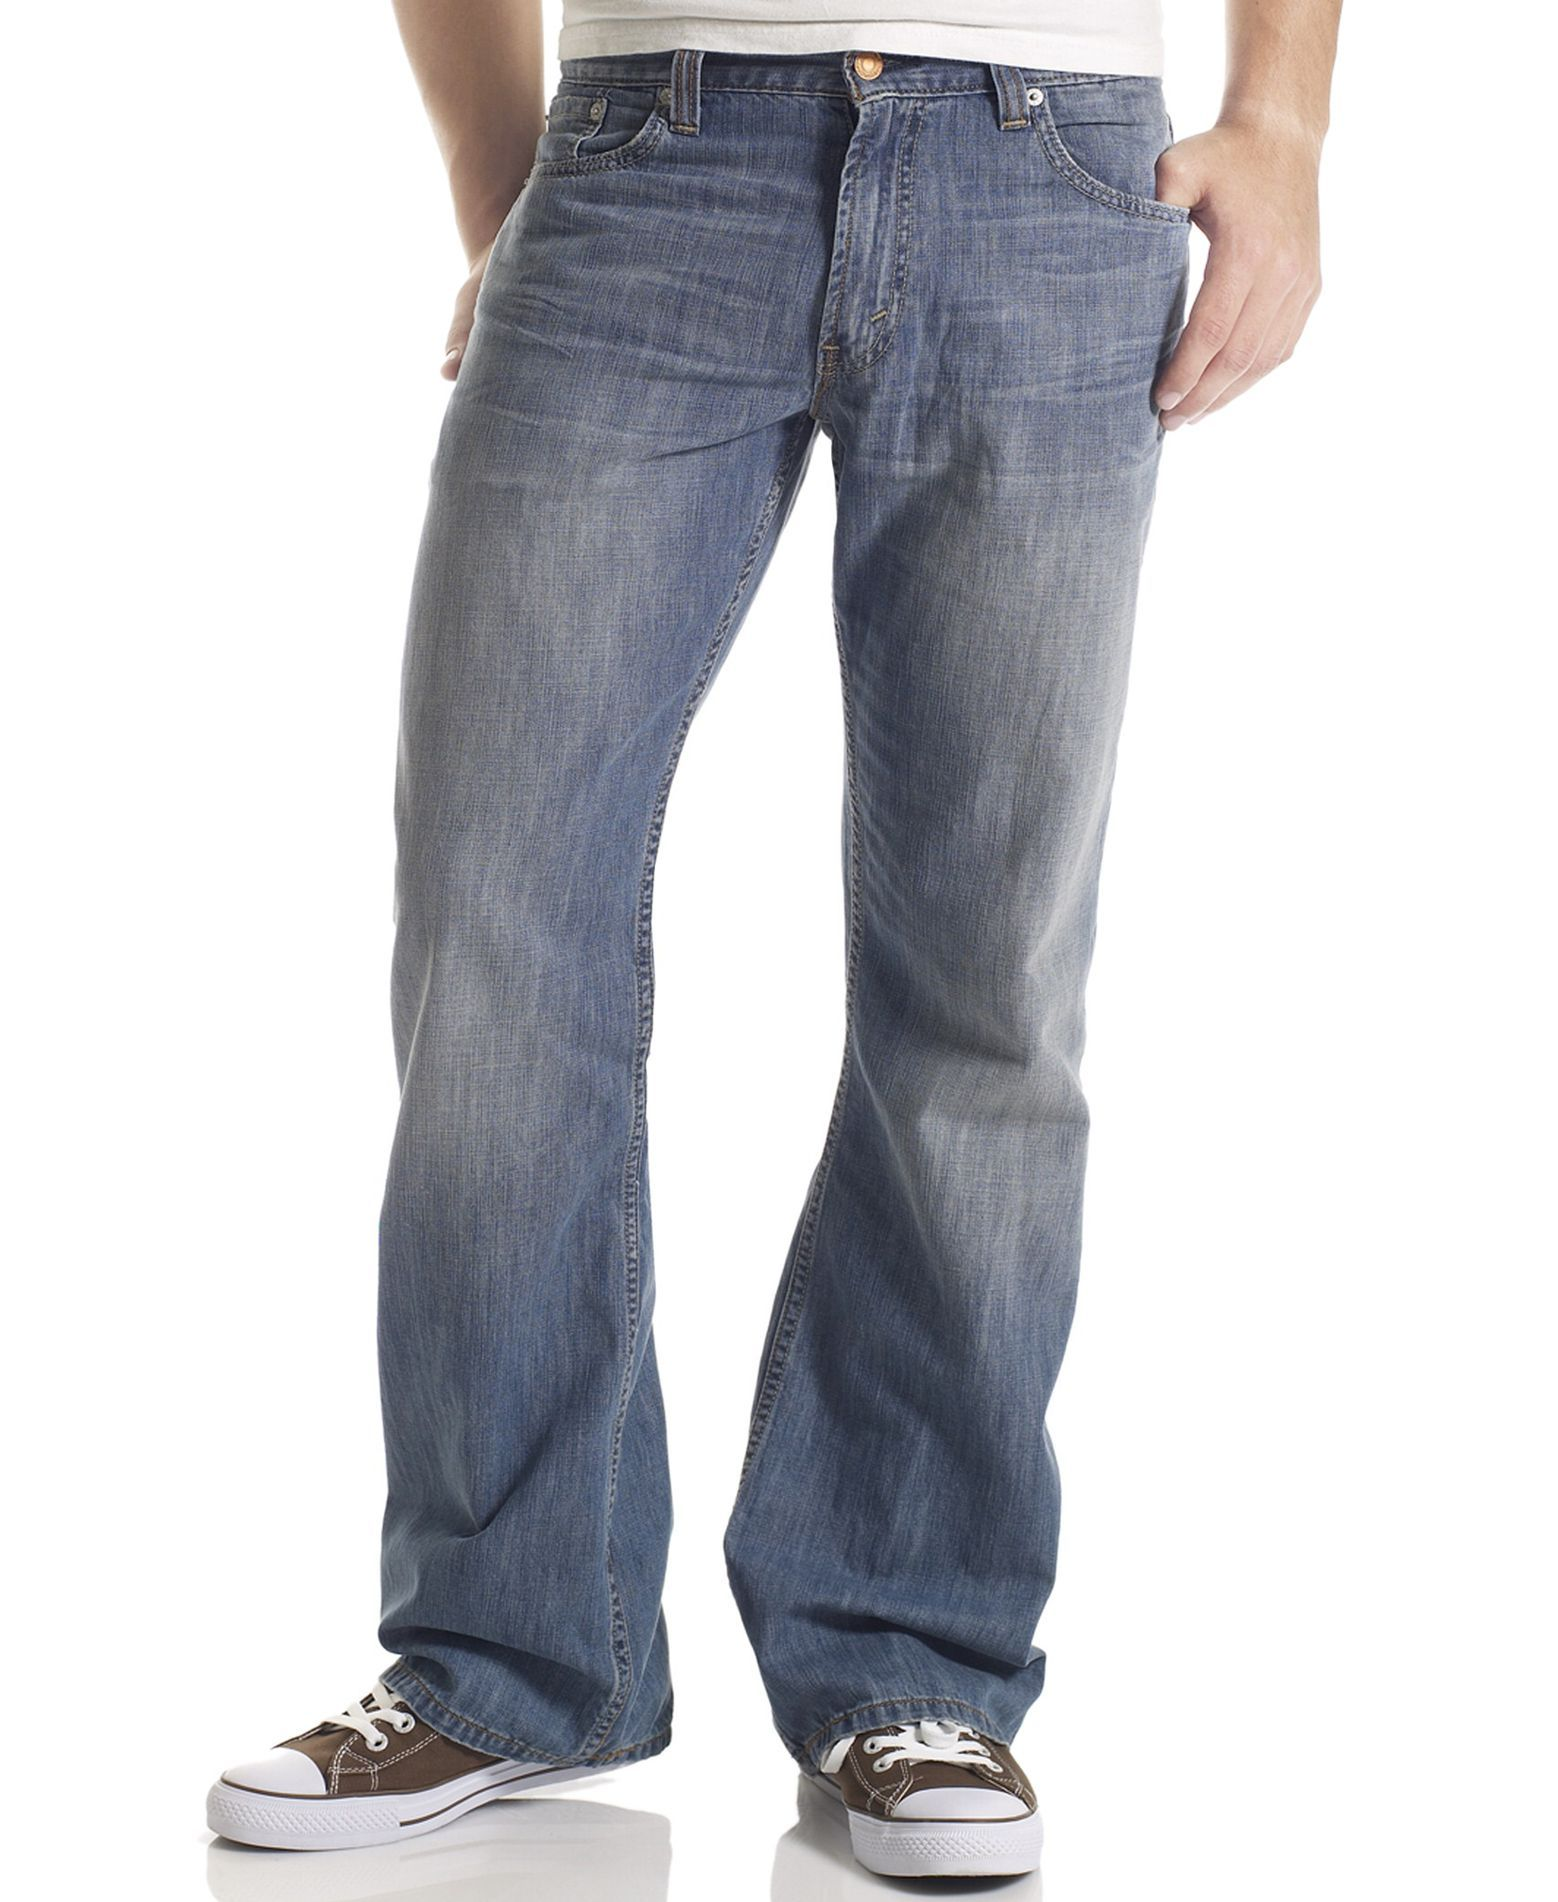 202873b844 Levi s 527 Slim Bootcut Fit Medium Chipped Wash Jeans